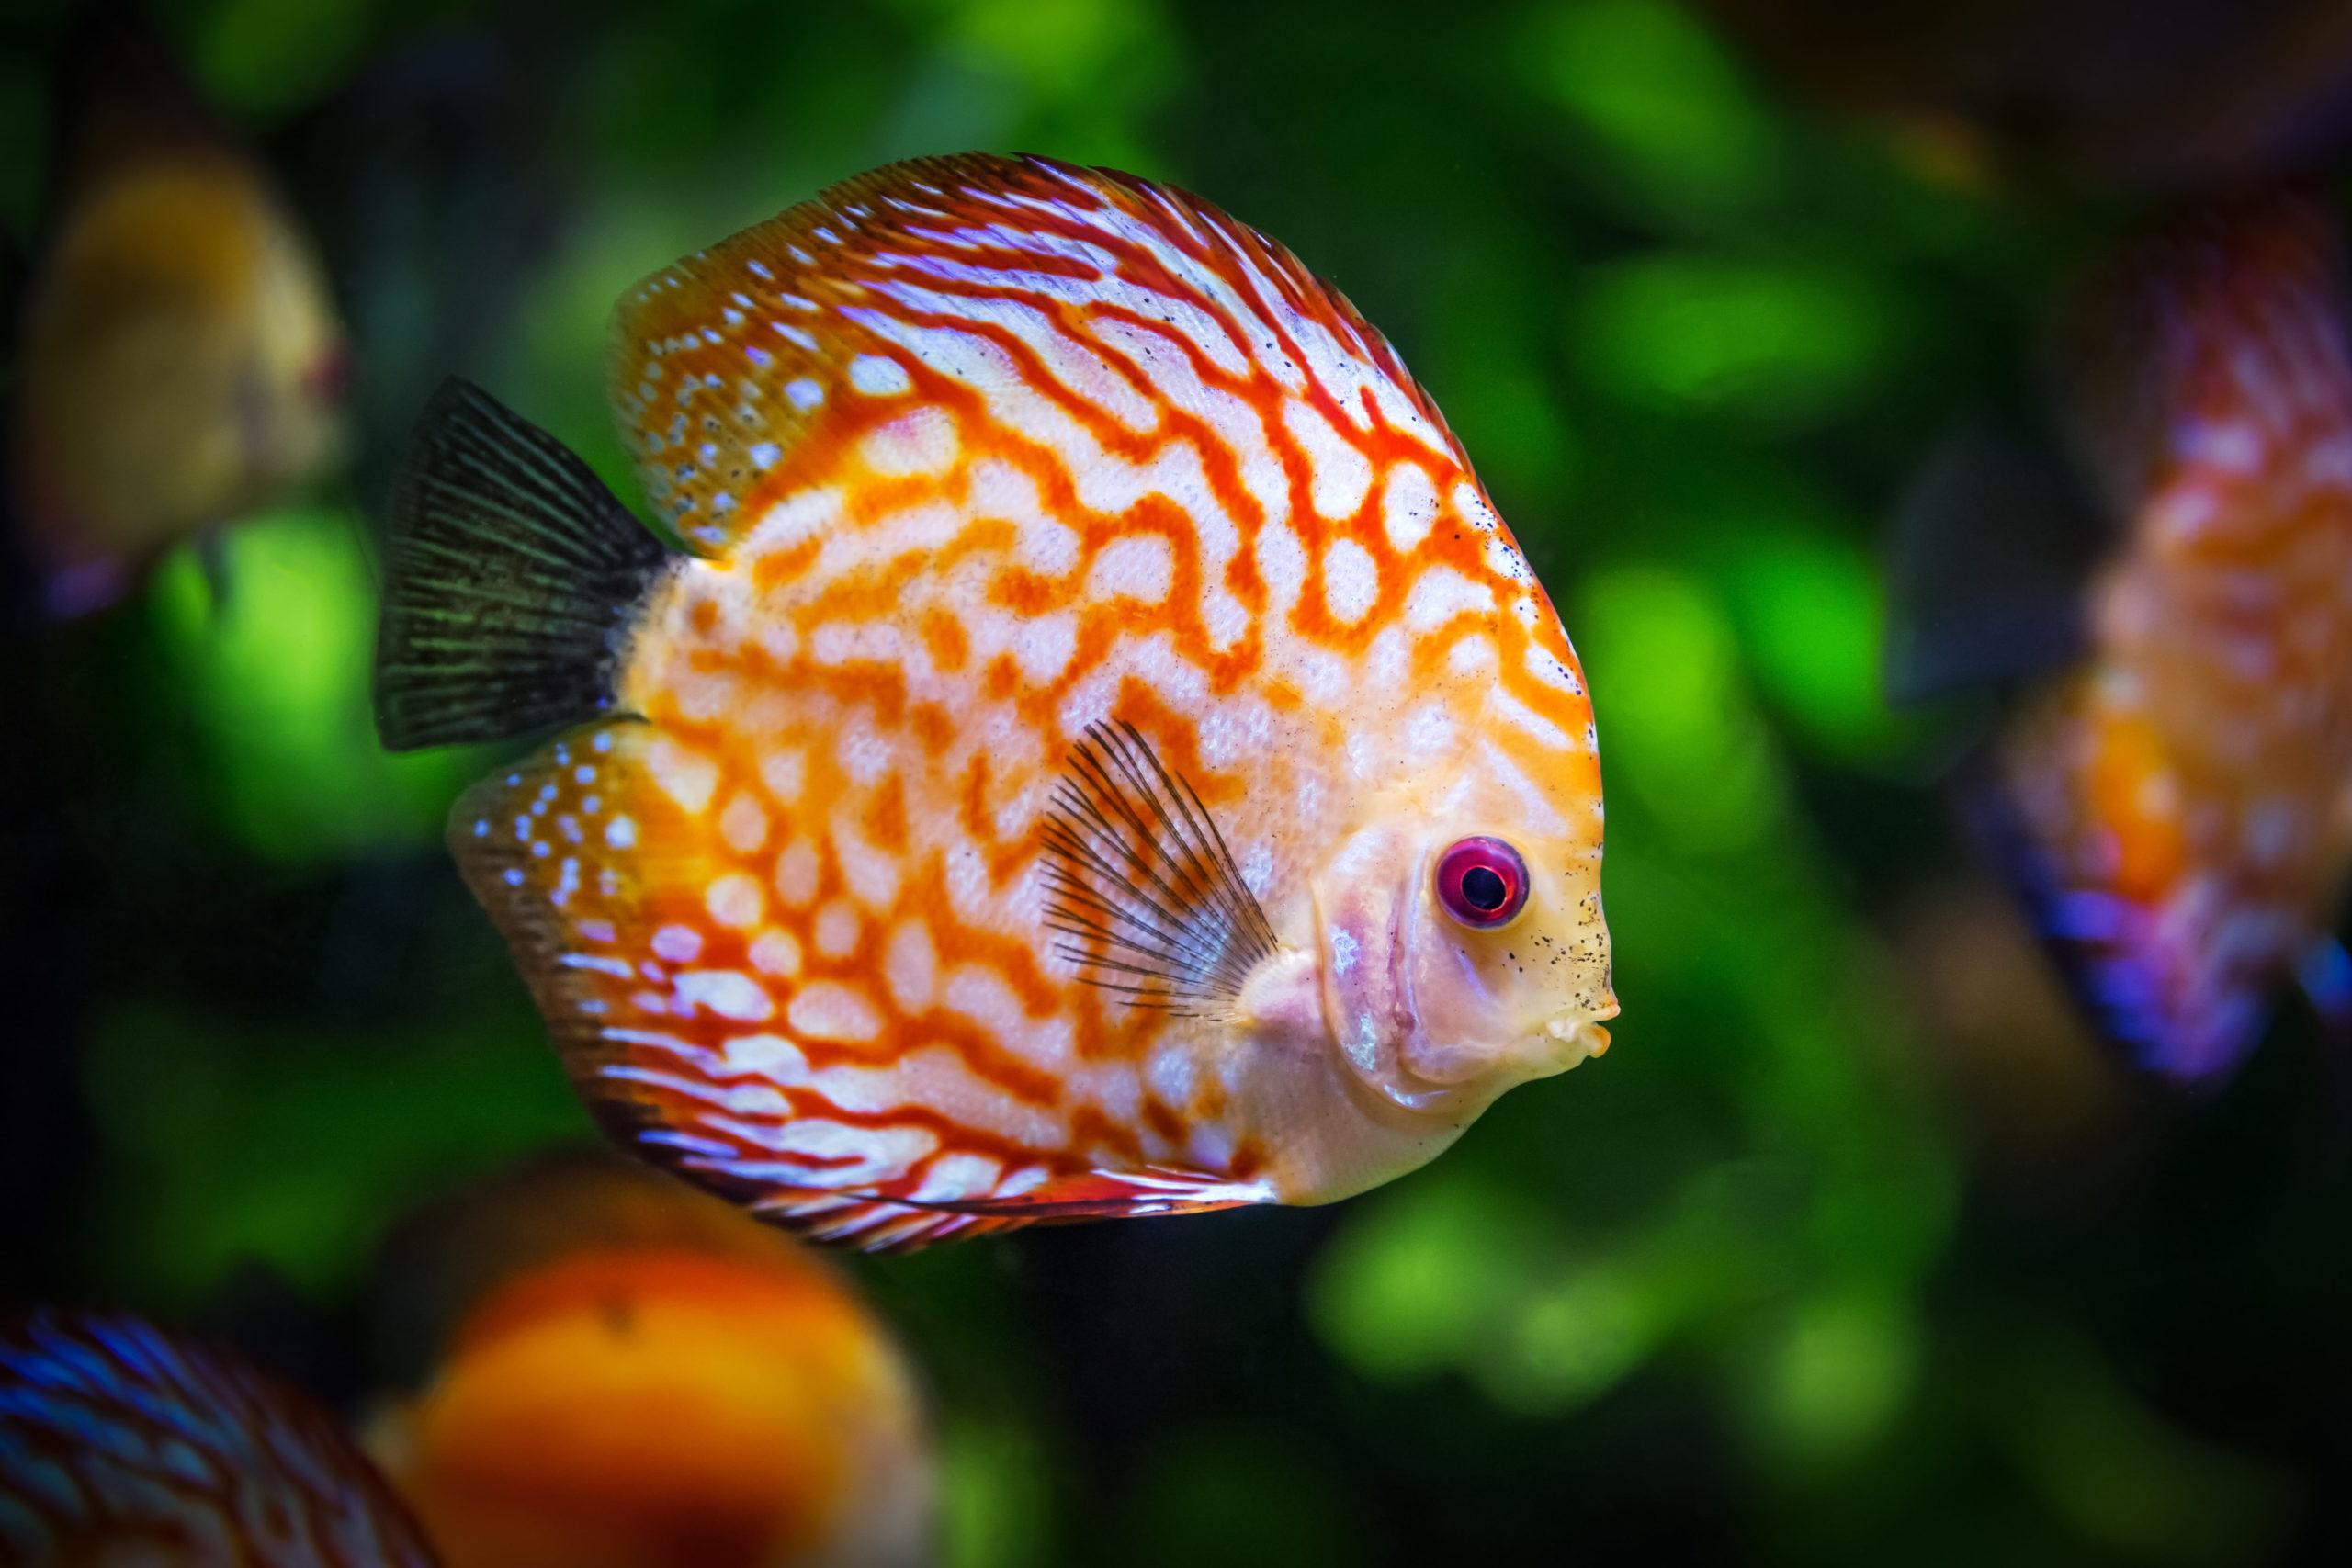 Live Fish Feel Bad For Dead Fish Claims PETA